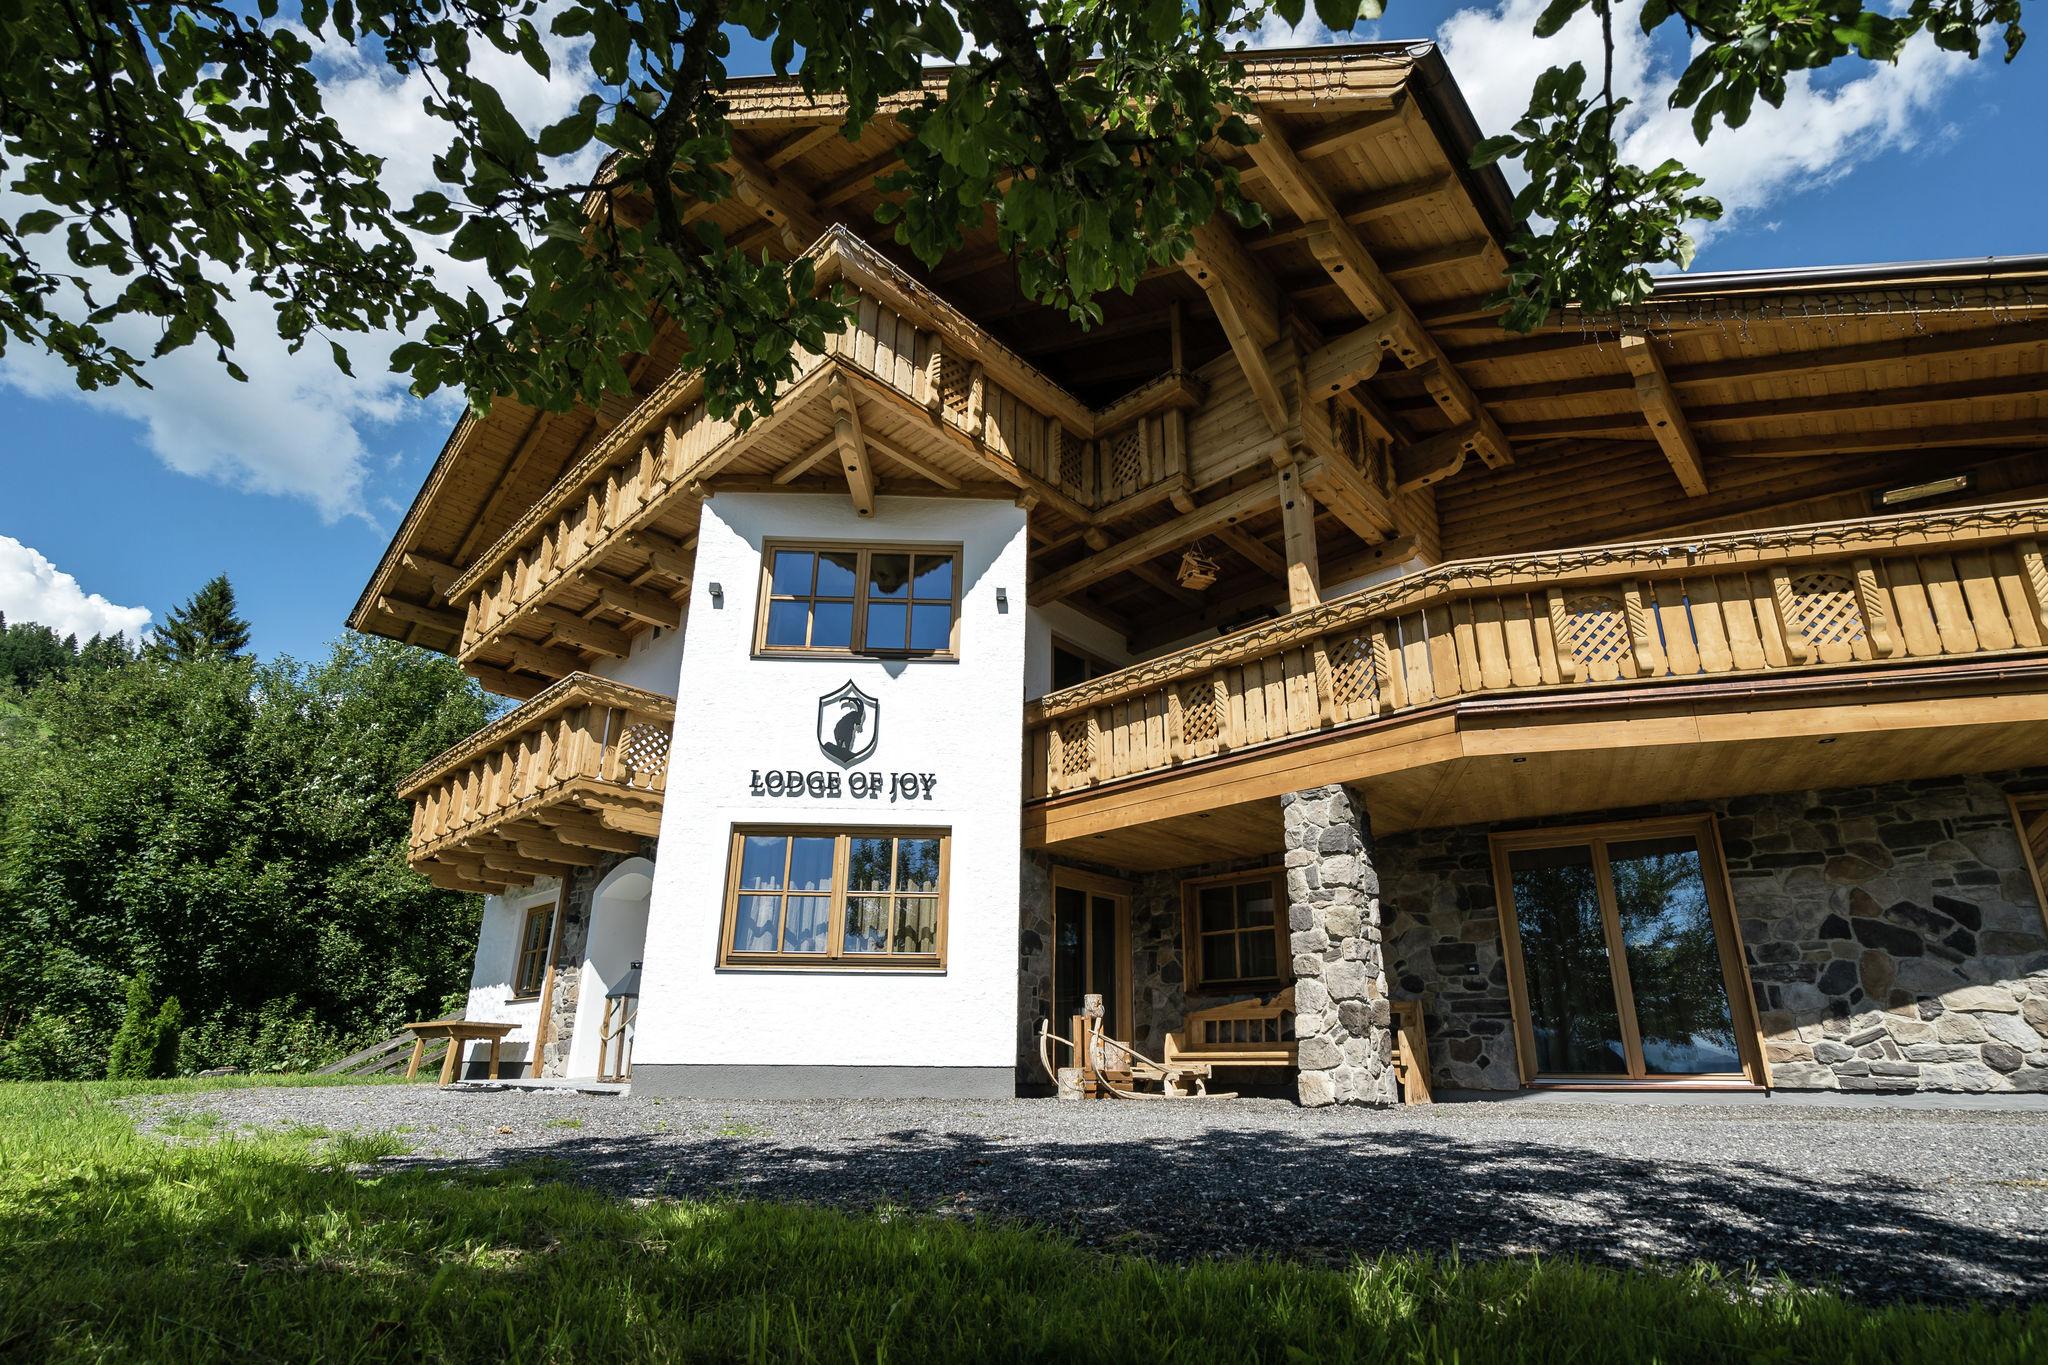 Lodge of Joy